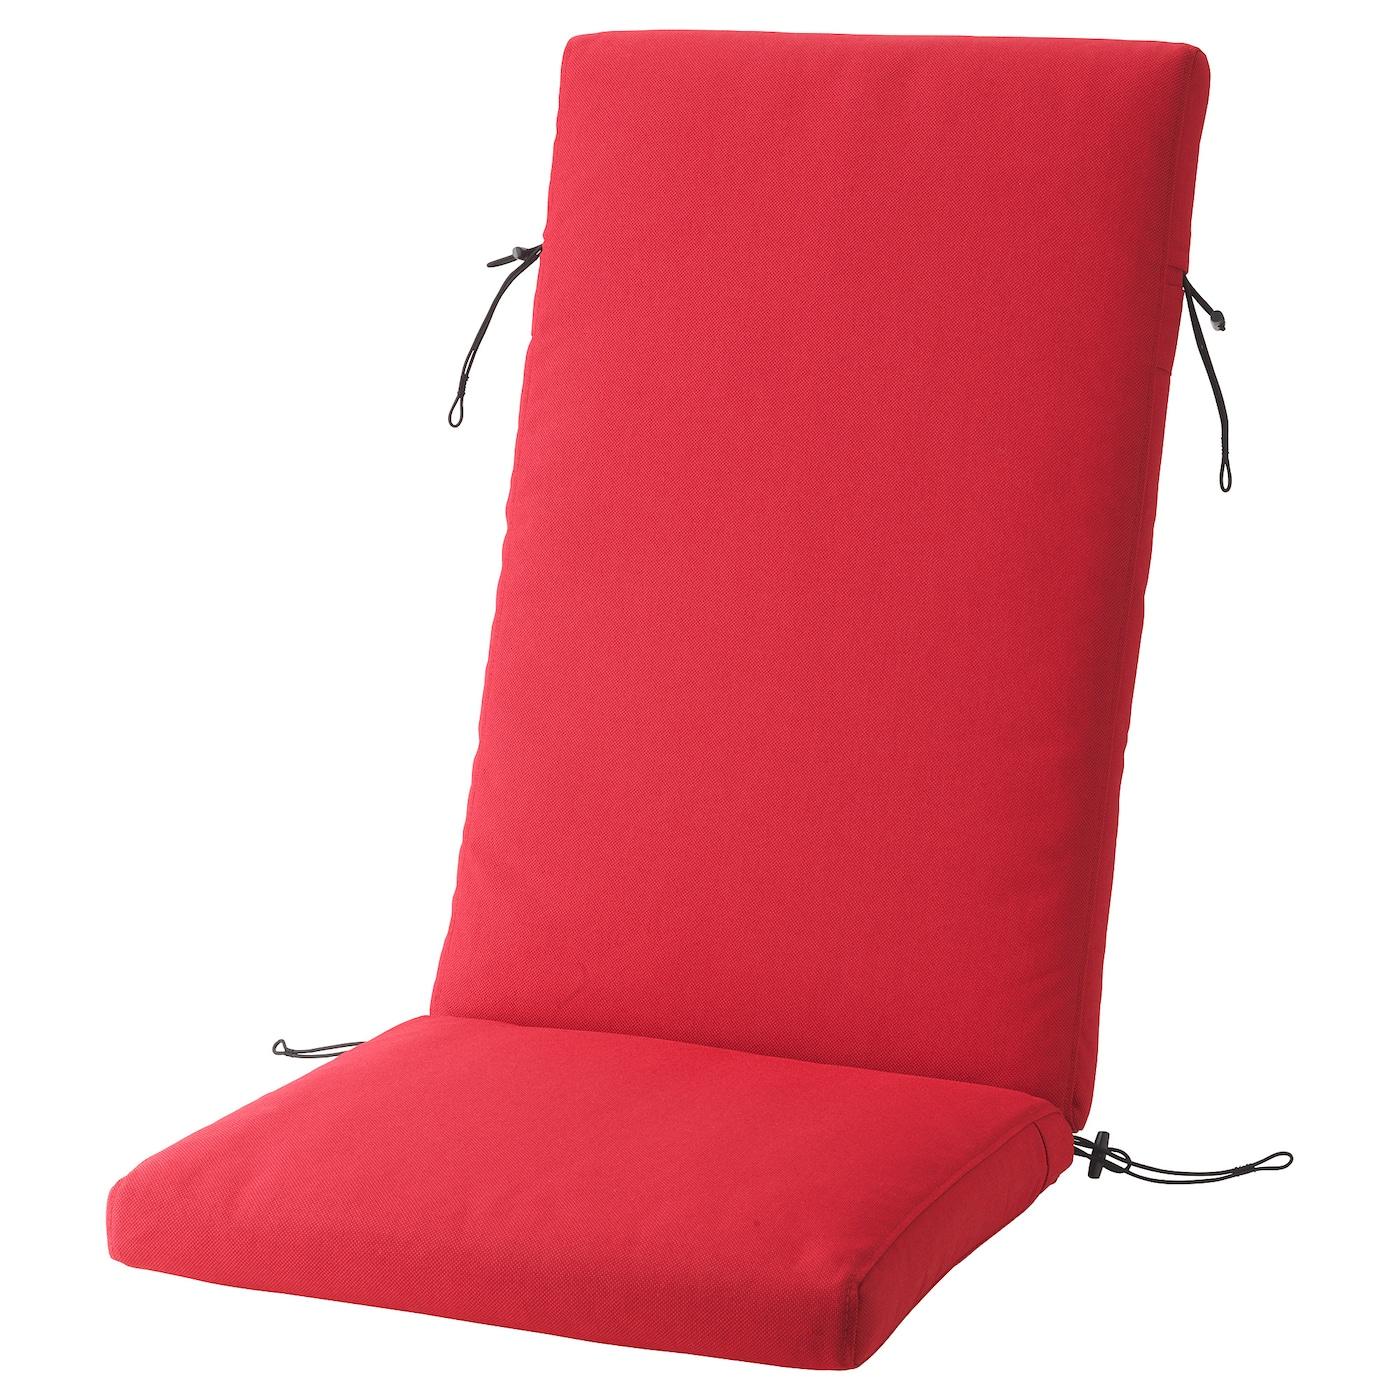 fr s n duvholmen coussin assise dossier ext rieur rouge. Black Bedroom Furniture Sets. Home Design Ideas